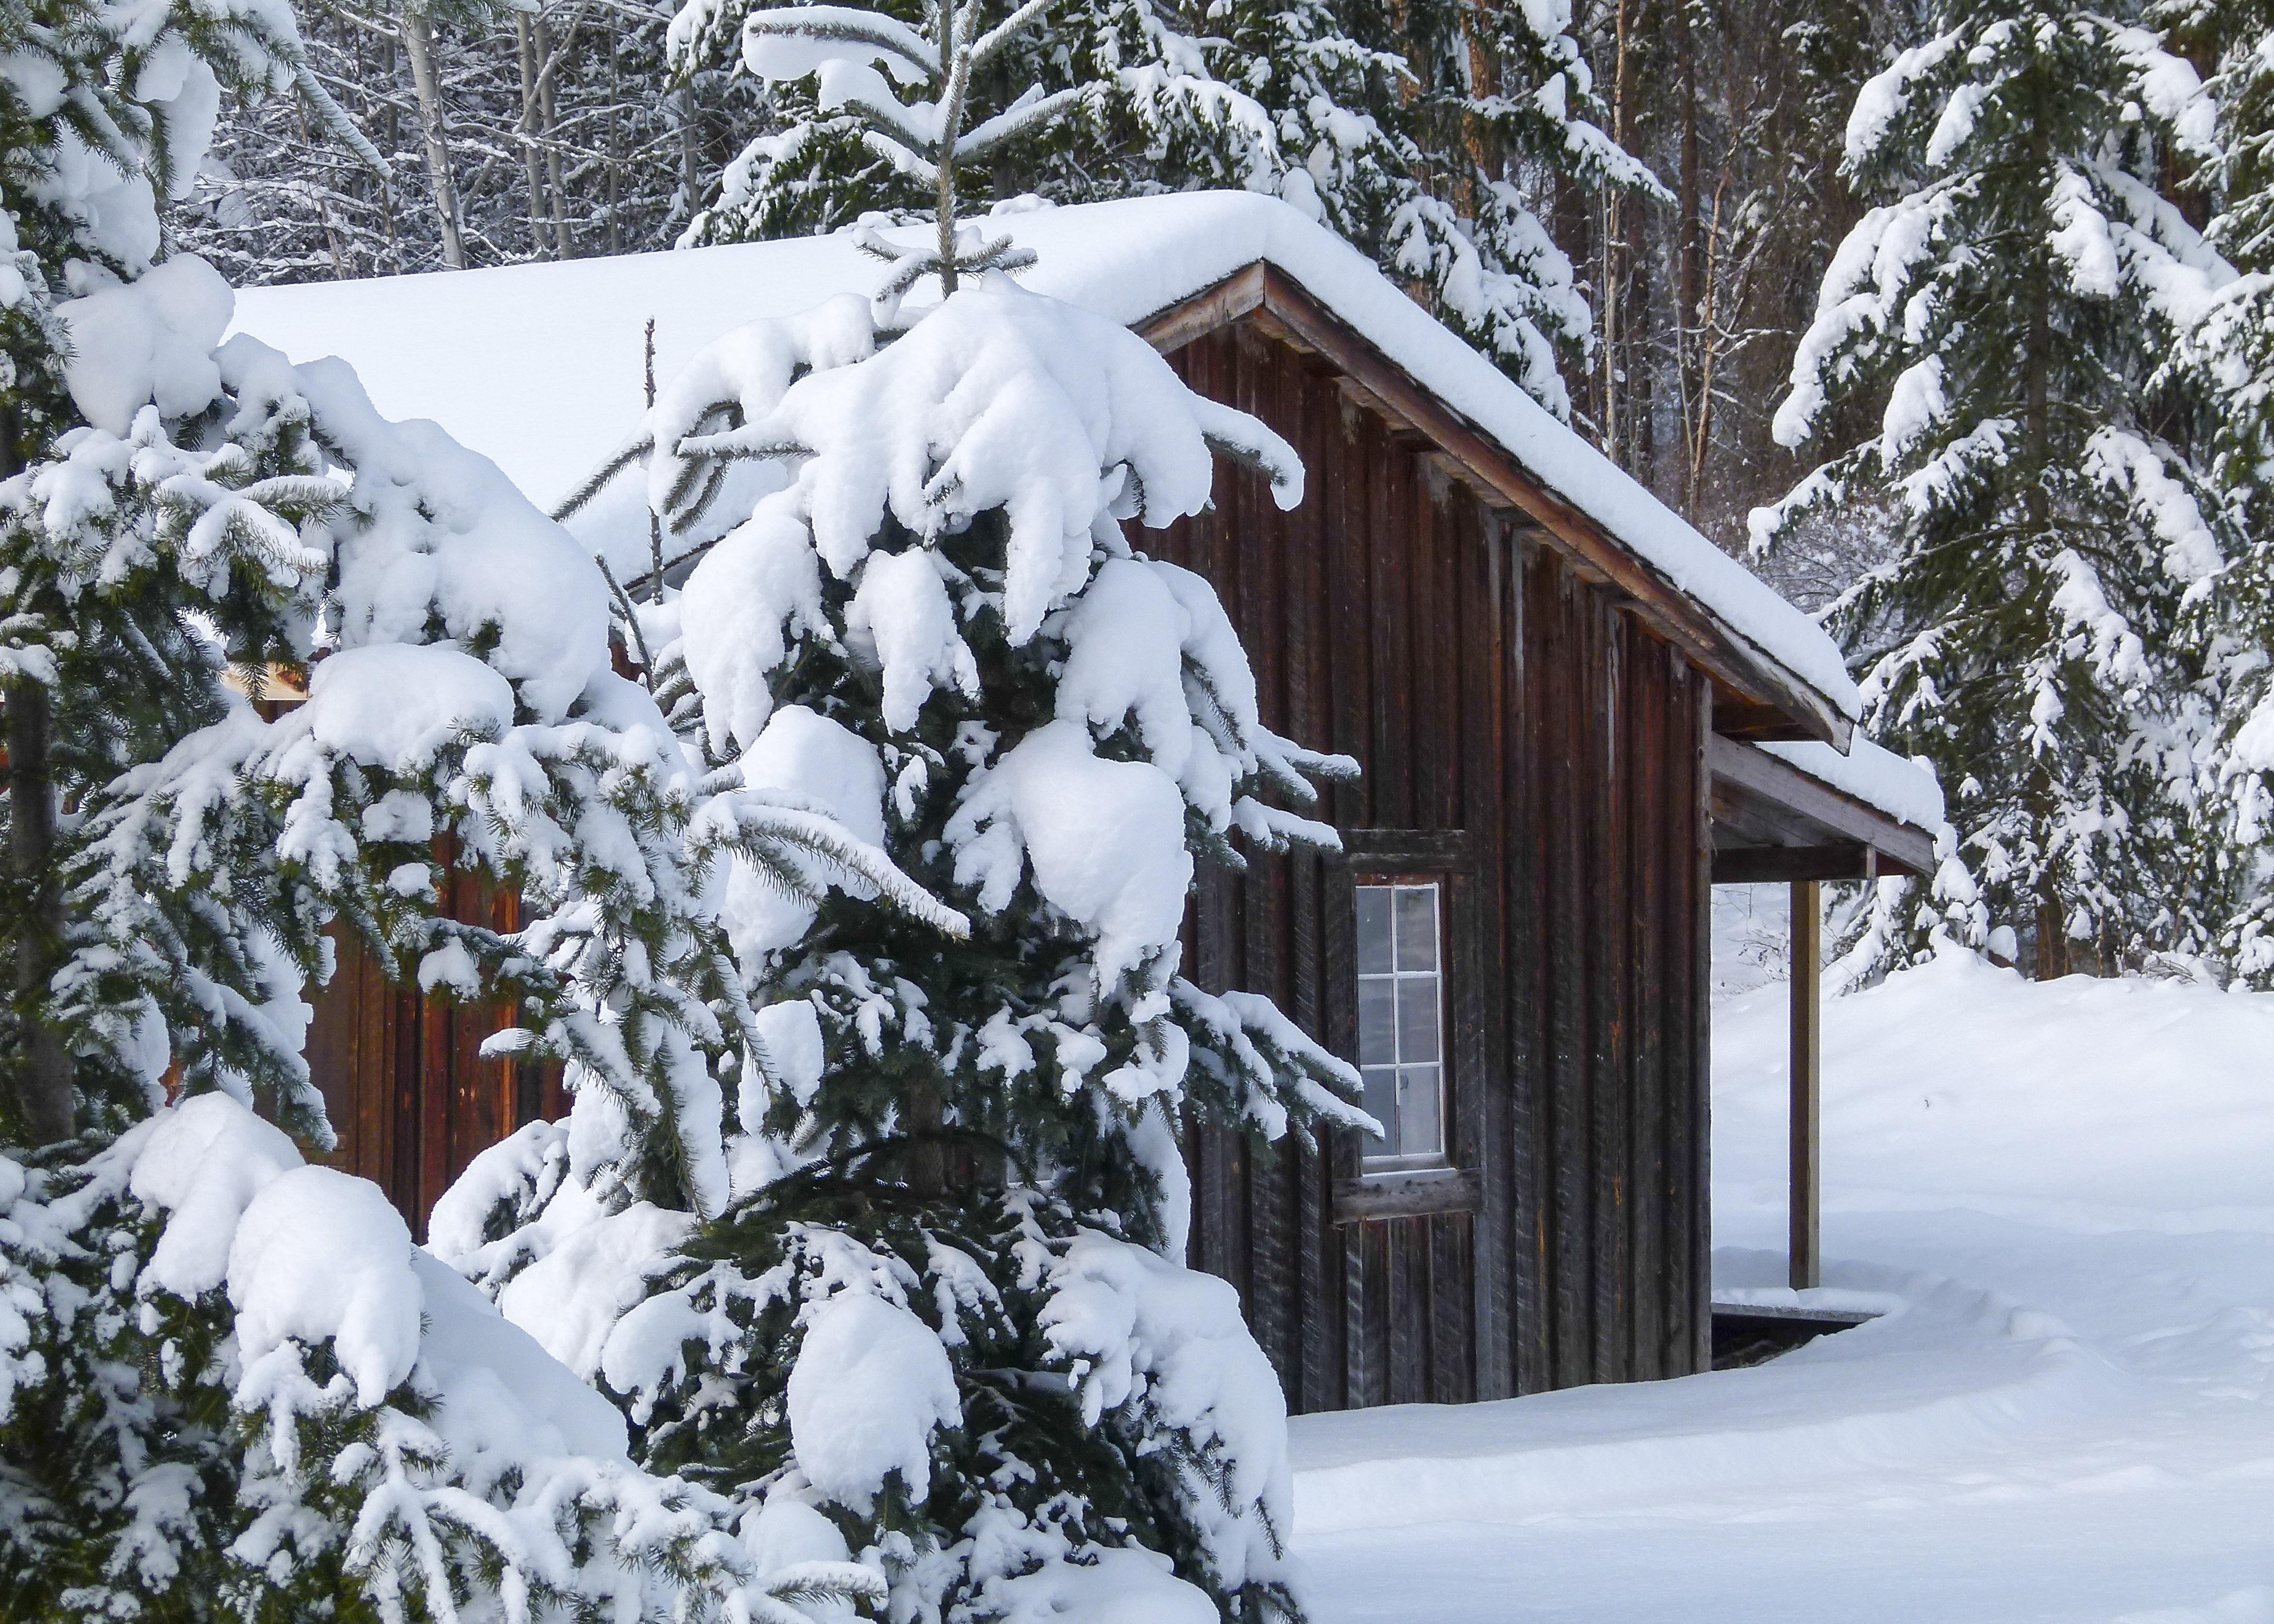 дача в снегу картинки системы